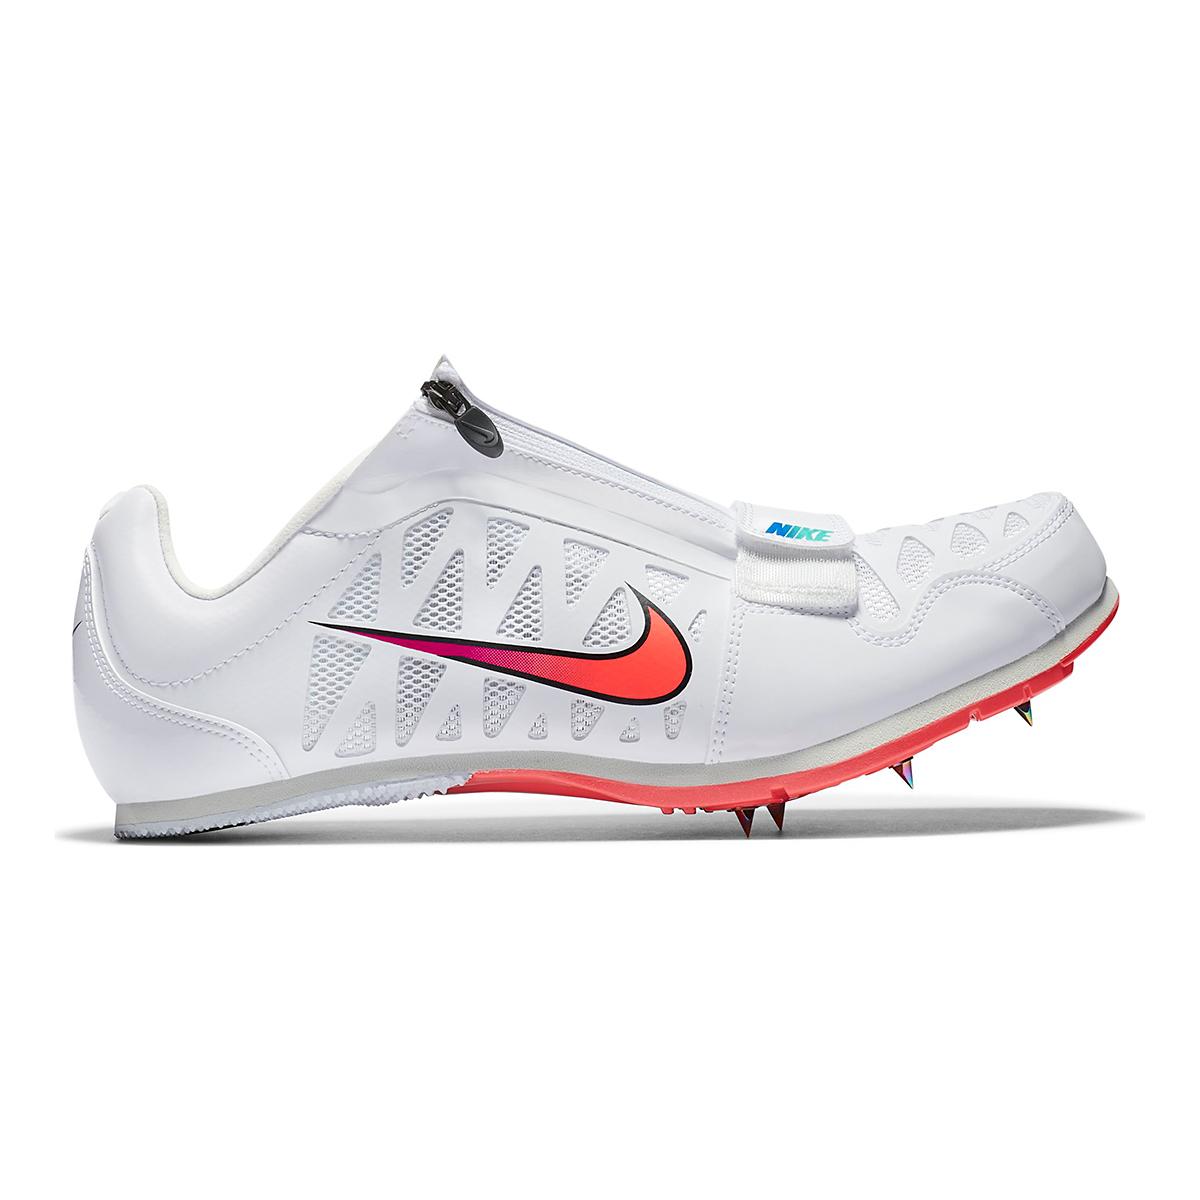 Nike Zoom Long Jump 4 Track Spikes - Color: White/Flash Crimson - Size: M4/W5.5 - Width: Regular, White/Flash Crimson, large, image 1